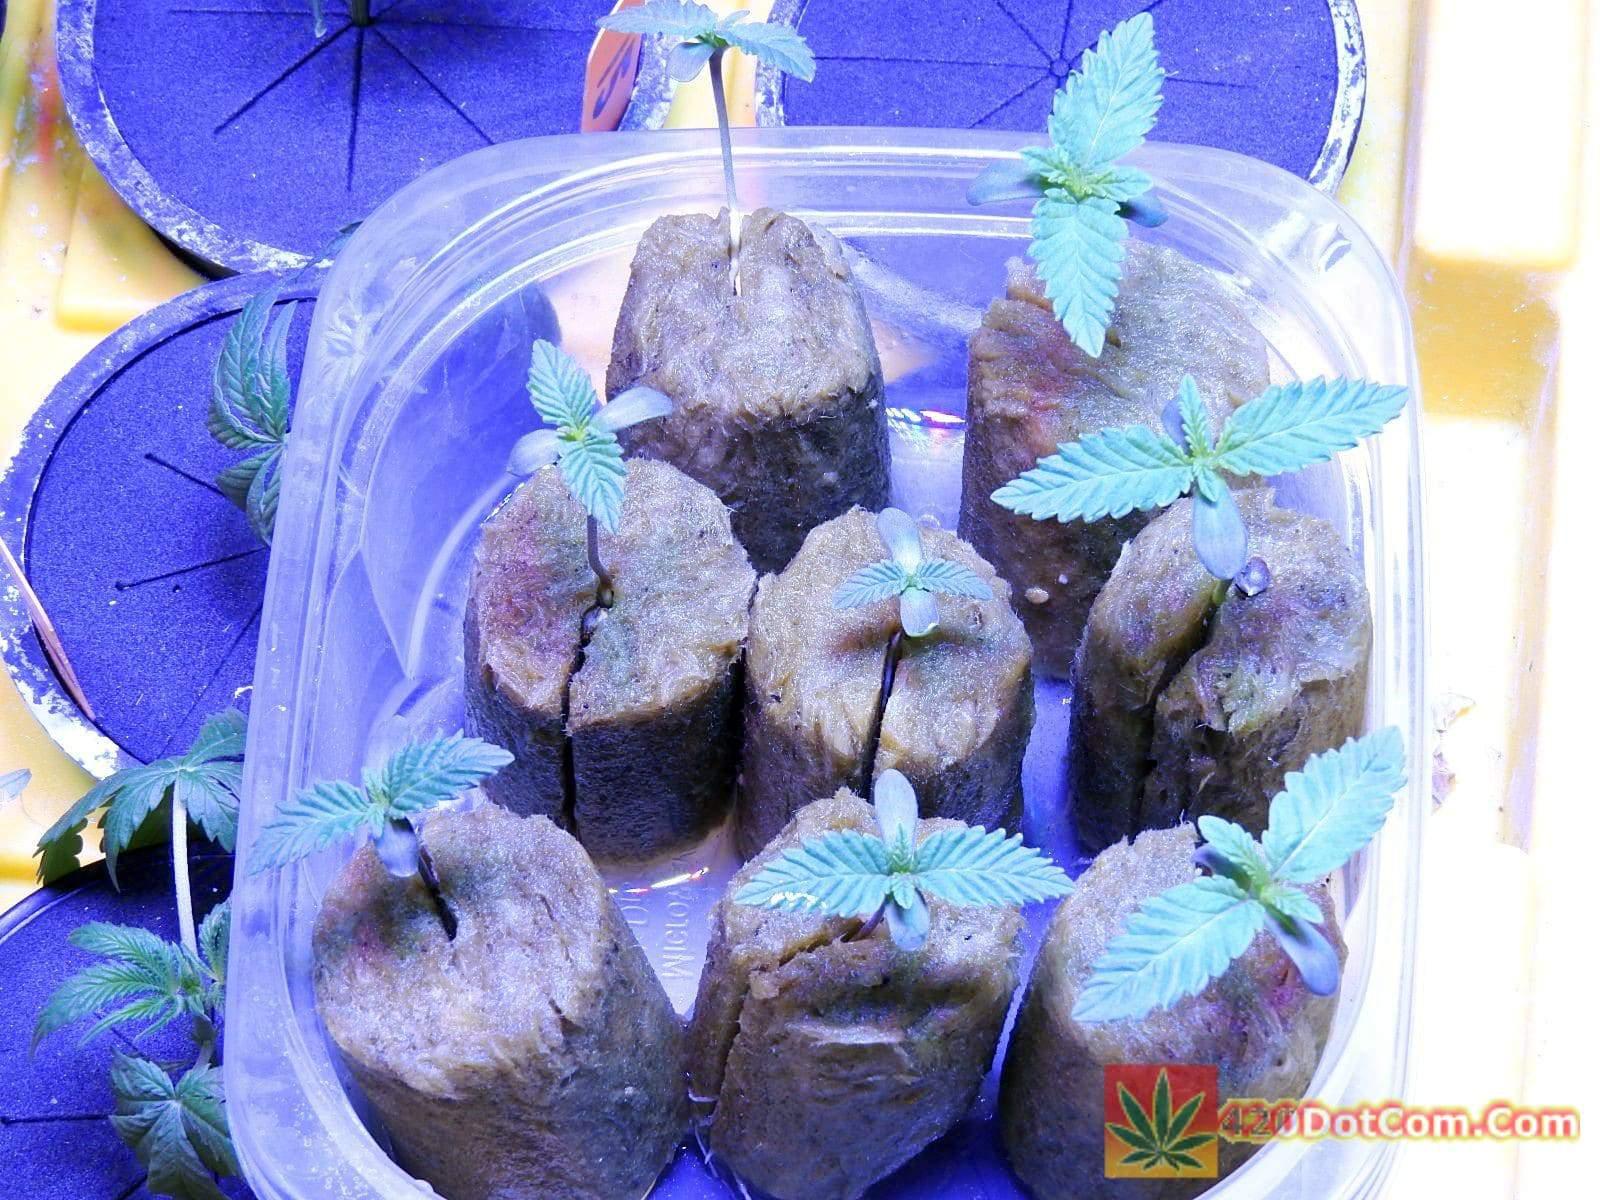 Vegging Cannabis With Cheap LED Aquarium Lighting makes nice short seedlings